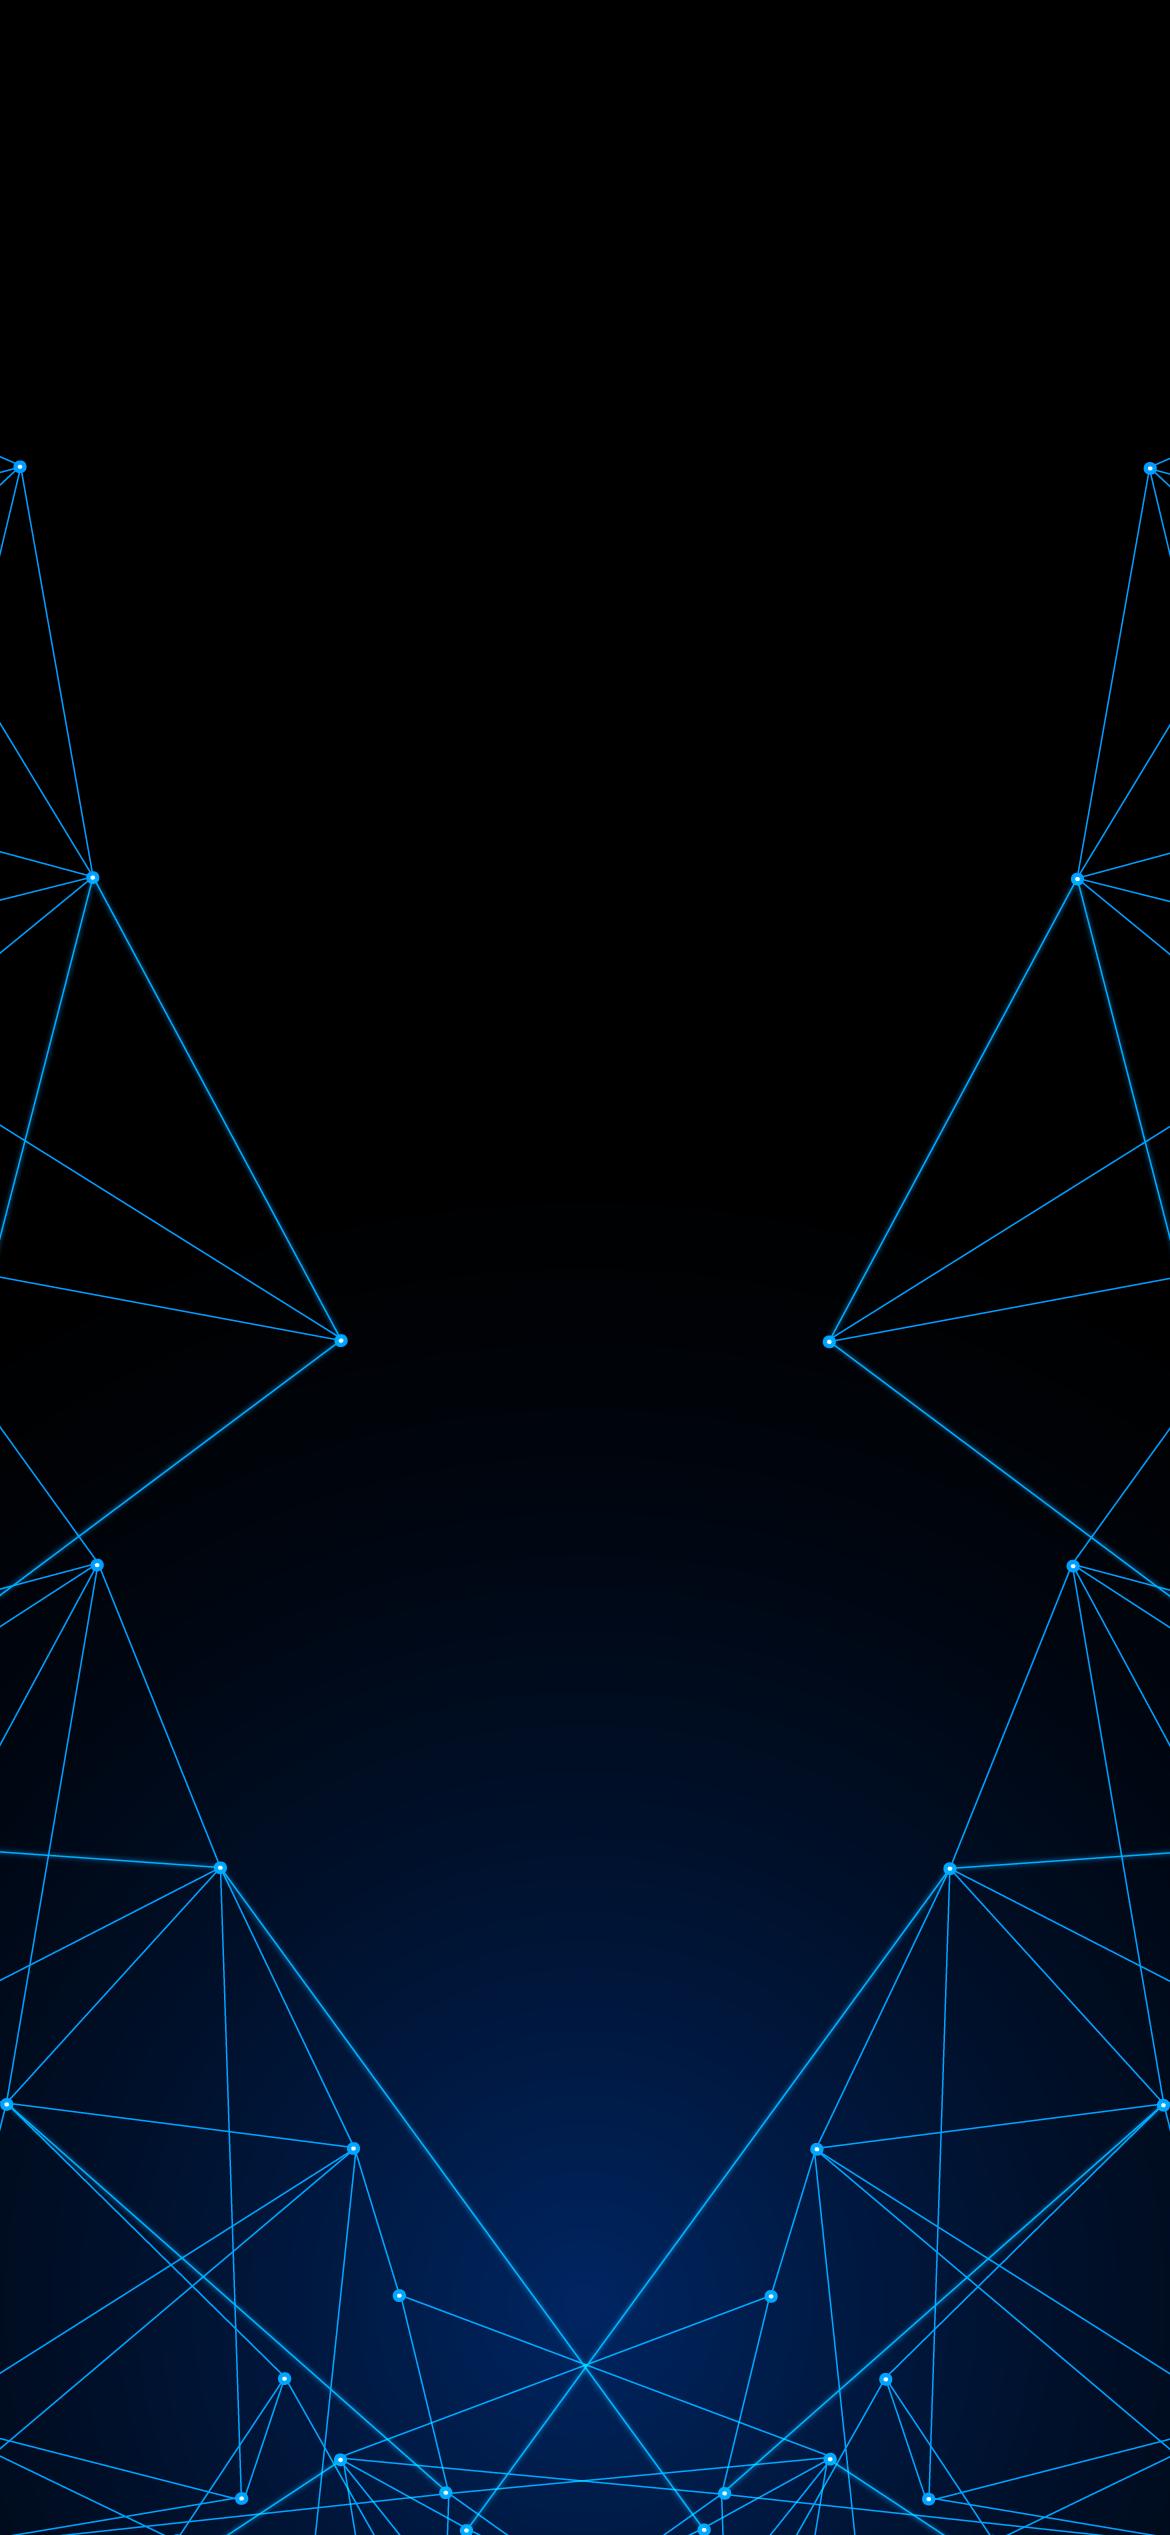 Network wallpaper for phone